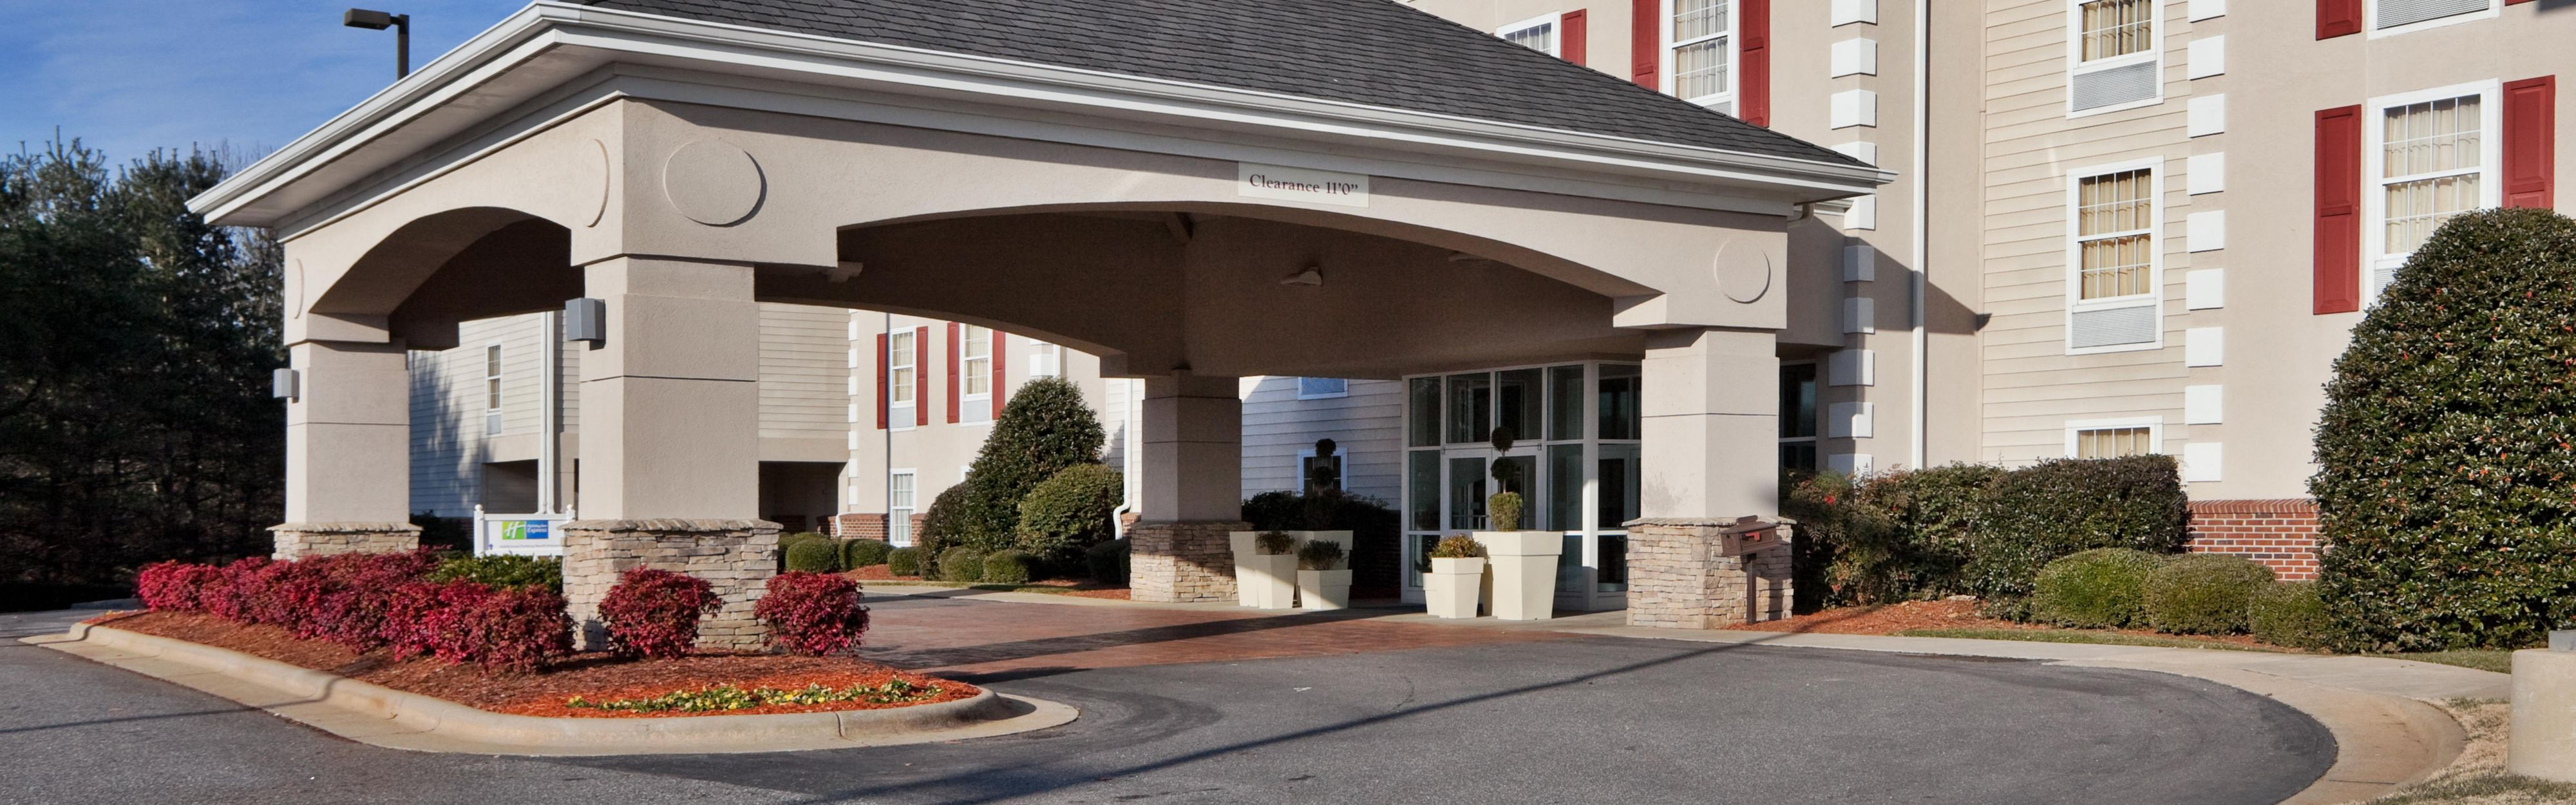 Holiday Inn Express Conover (Hickory Area) image 0